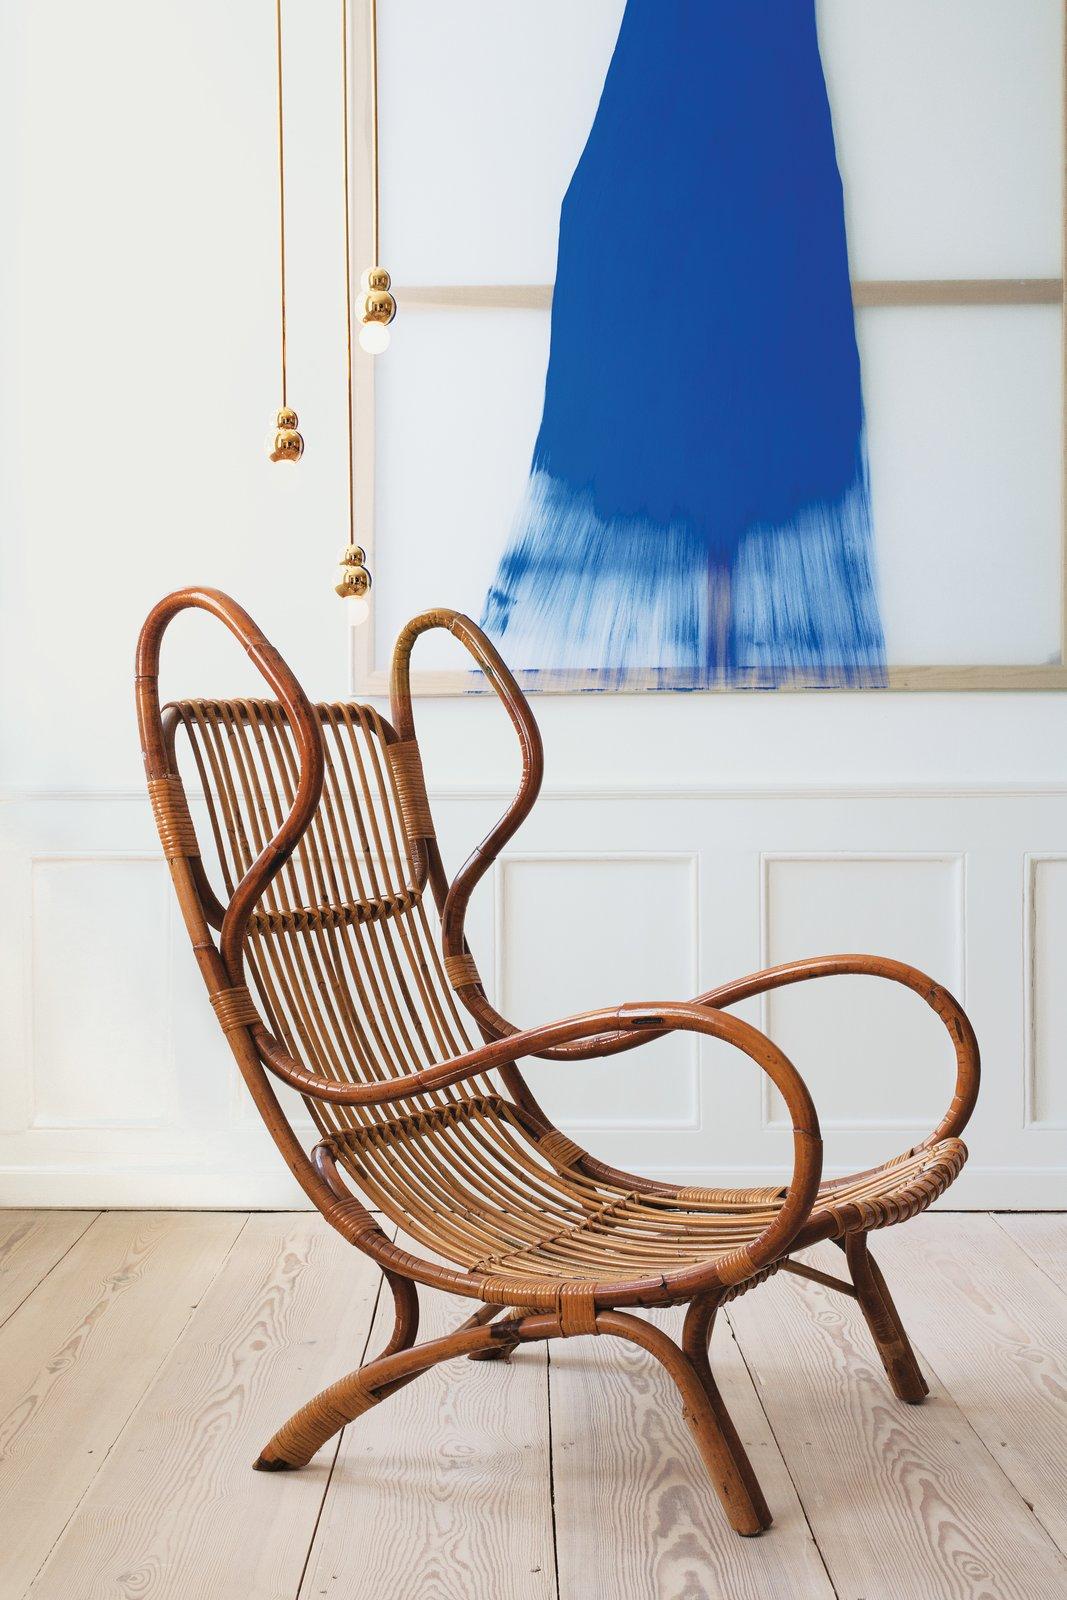 #interior #modern #inside #design #interiordesign #gioponti #chair #1963 #daniellergon #painting #balllights #michaelanastassiades #allwhitepaint #farrowandball #wickerchair #wicker #lighting #art #seatingdesign #seating  Photo courtesy of the Apartment 100+ Best Modern Seating Designs by Dwell